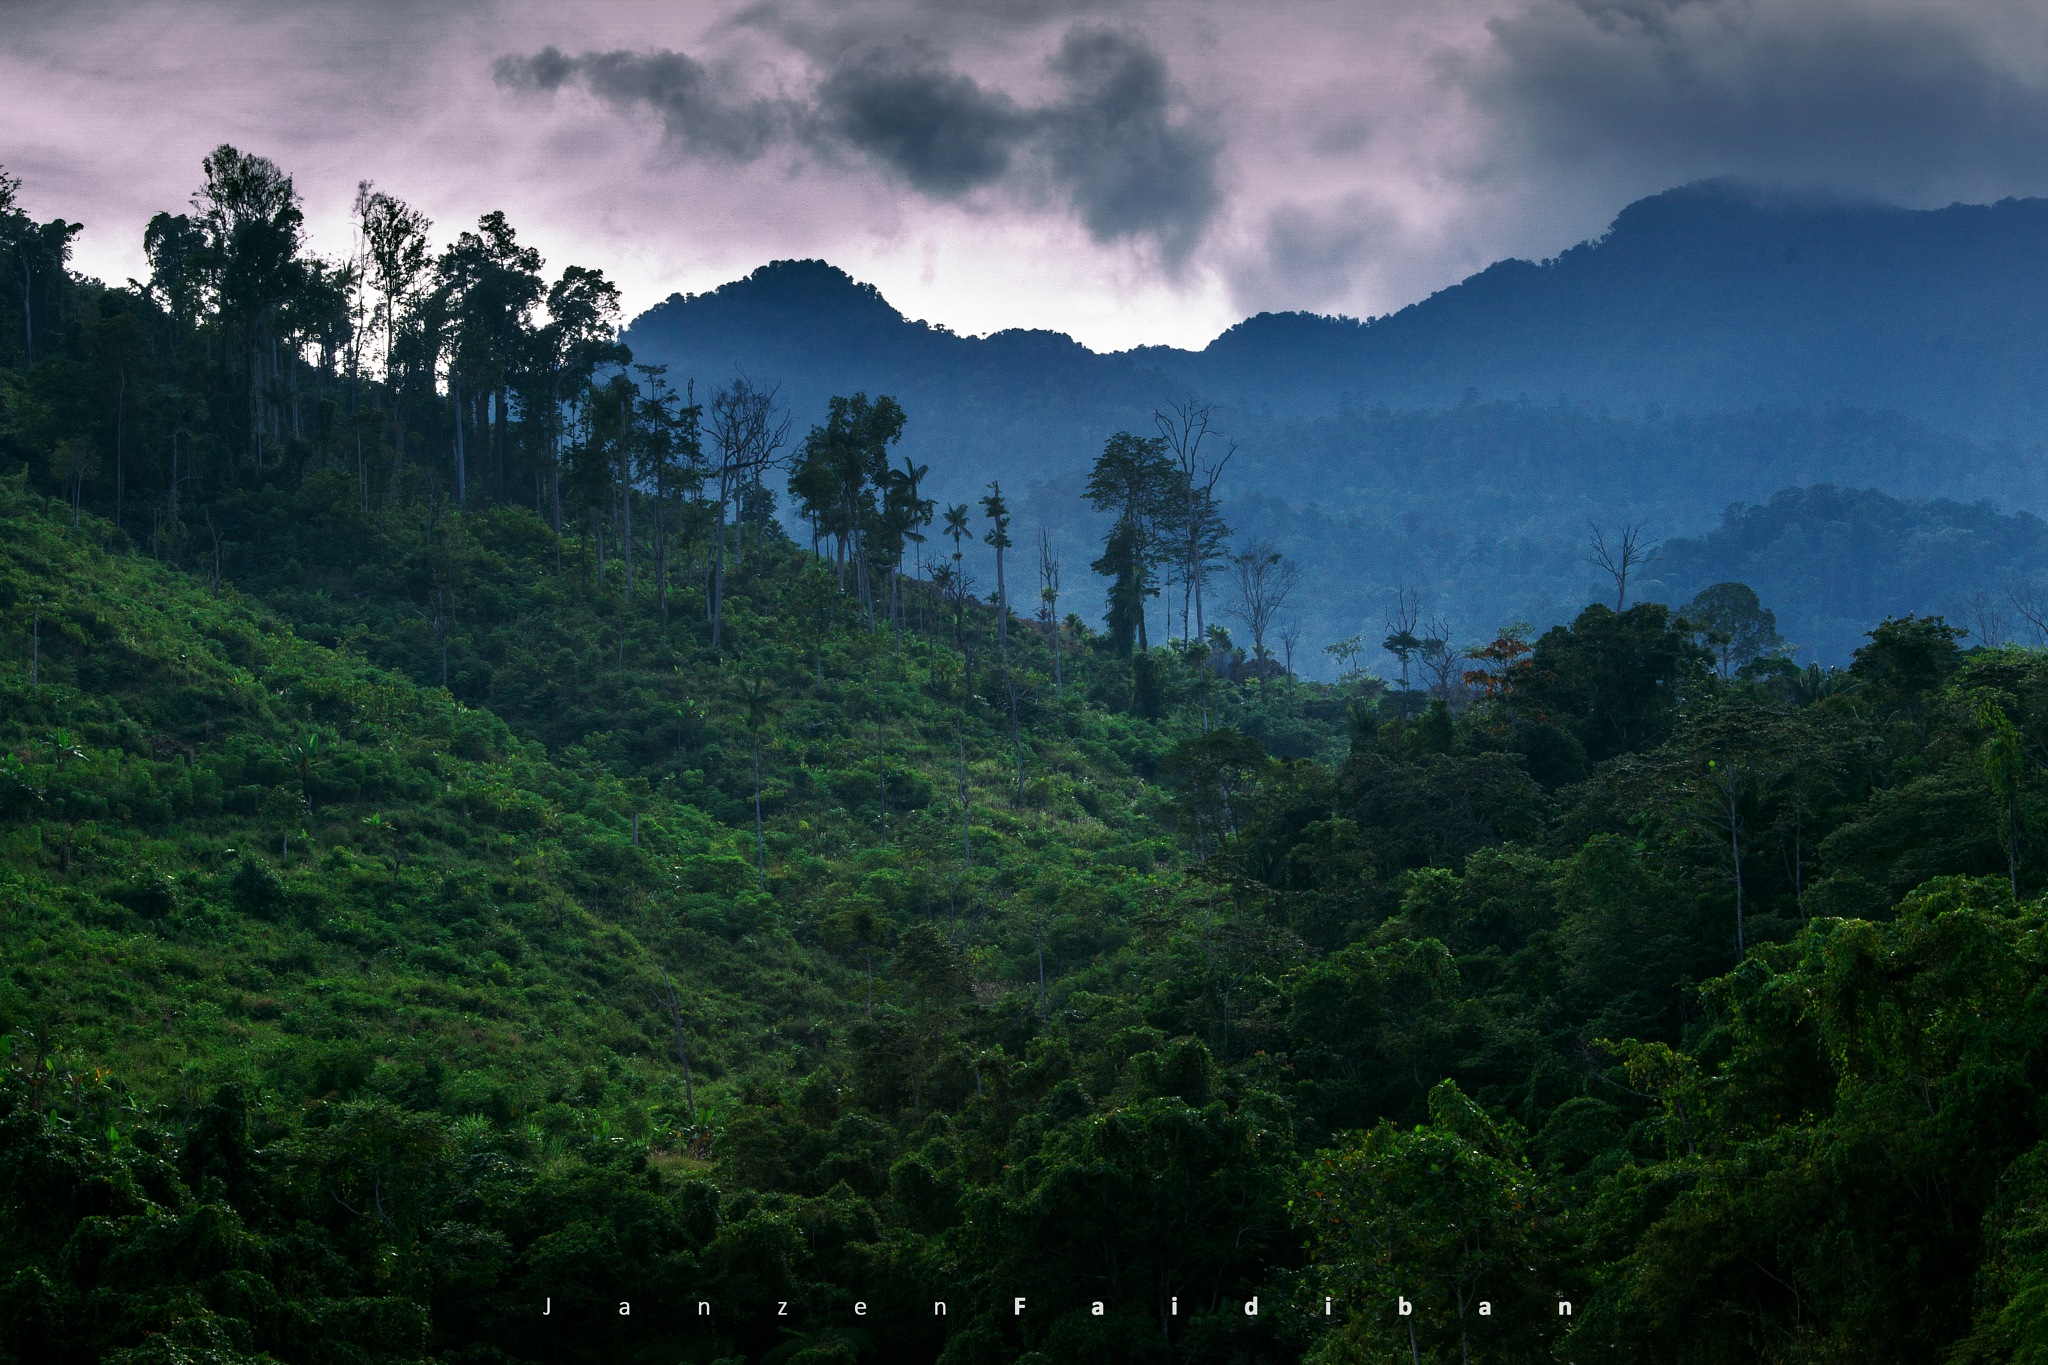 Tropical Forest of New Guinea Island by Janzen Faidiban